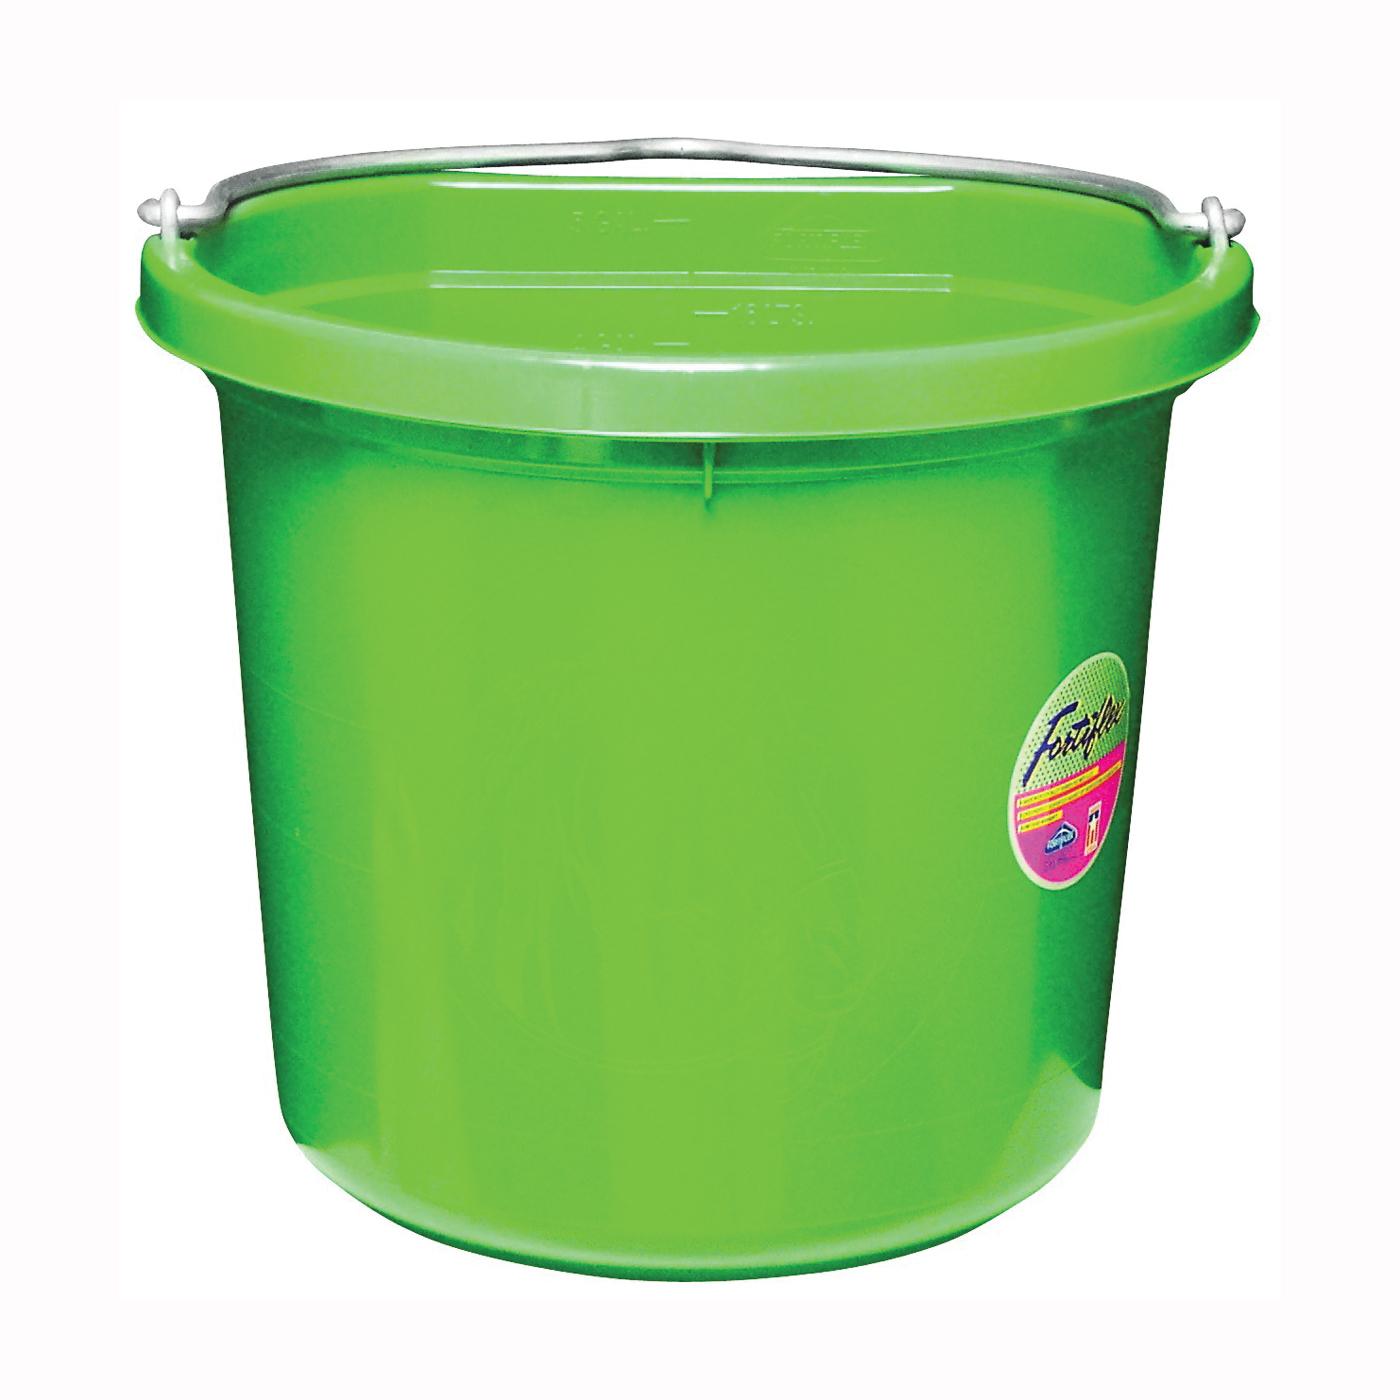 Picture of FORTEX-FORTIFLEX FB-120 Series FB-120GR Bucket, 20 qt Volume, Rubber/Polyethylene, Green